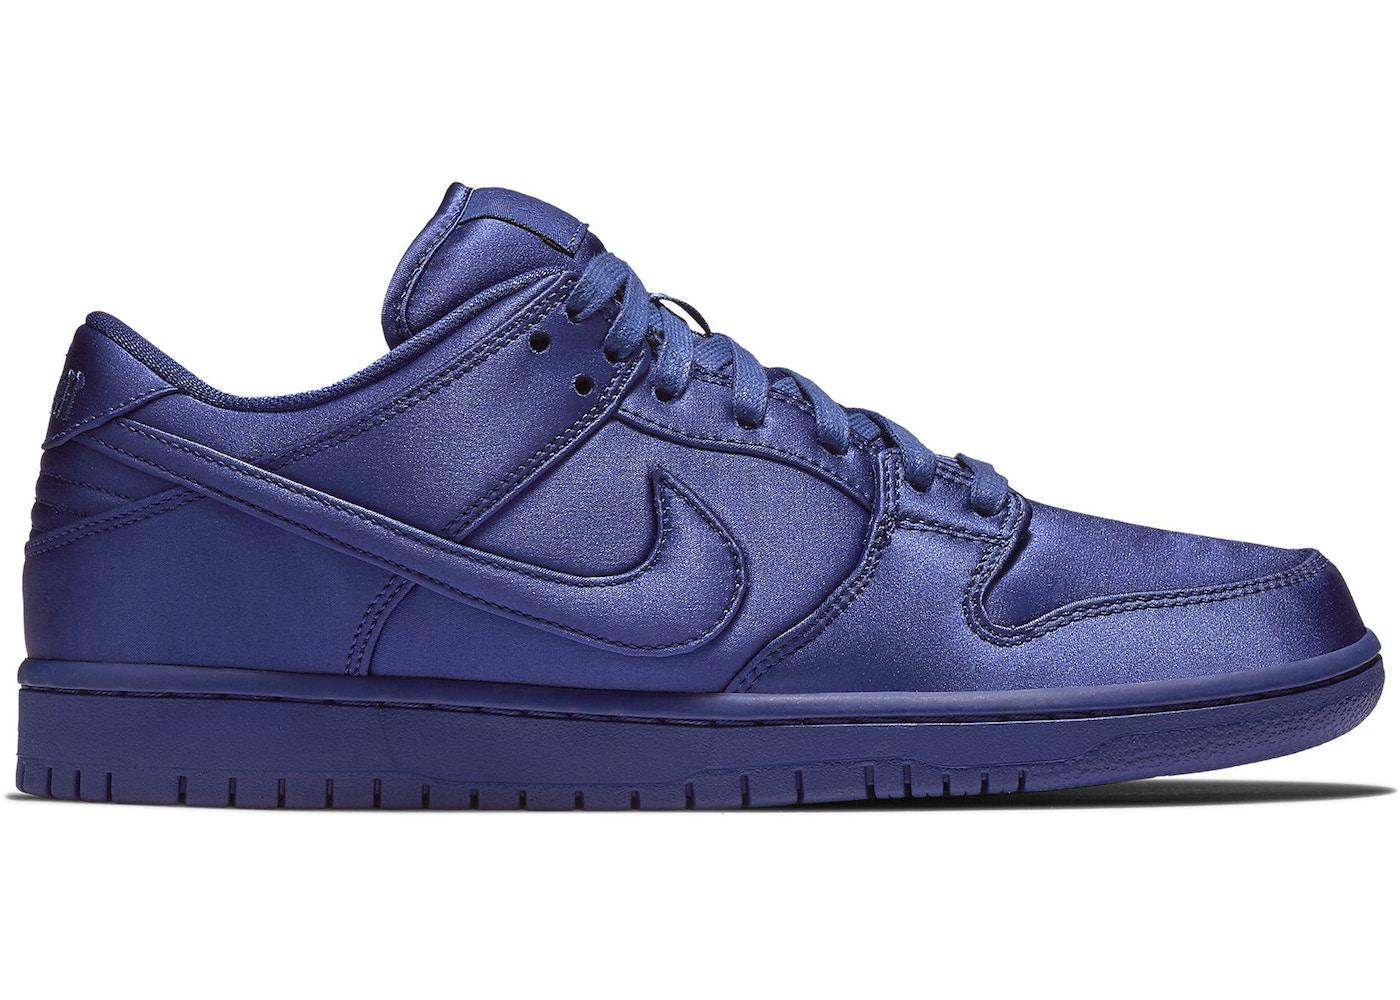 Nike SB SB Dunk Low Shoes - Total Sold 37ef118c8